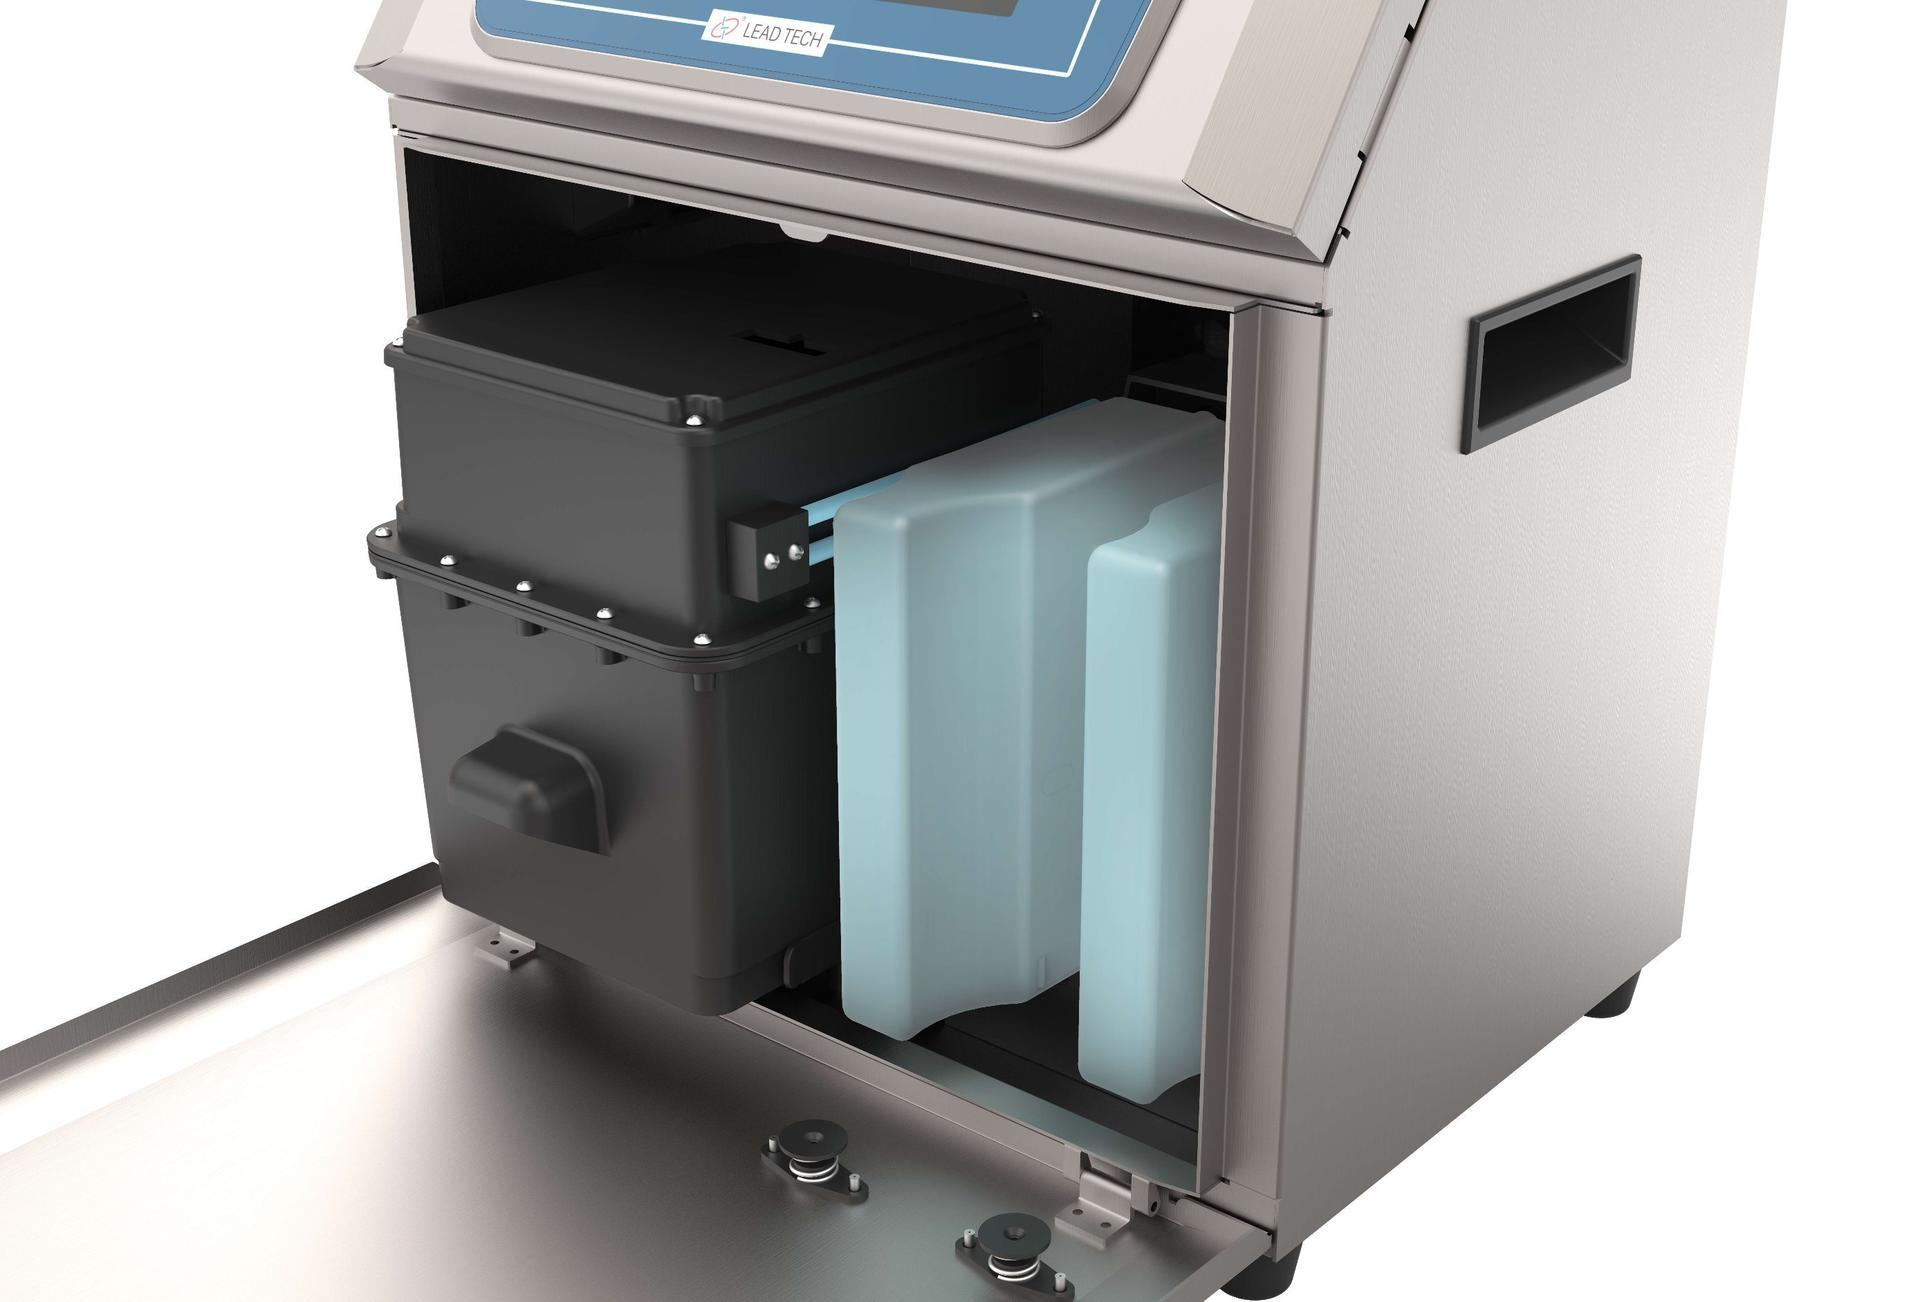 Lt800 Black to Blue Coding Cij Inkjet Printer